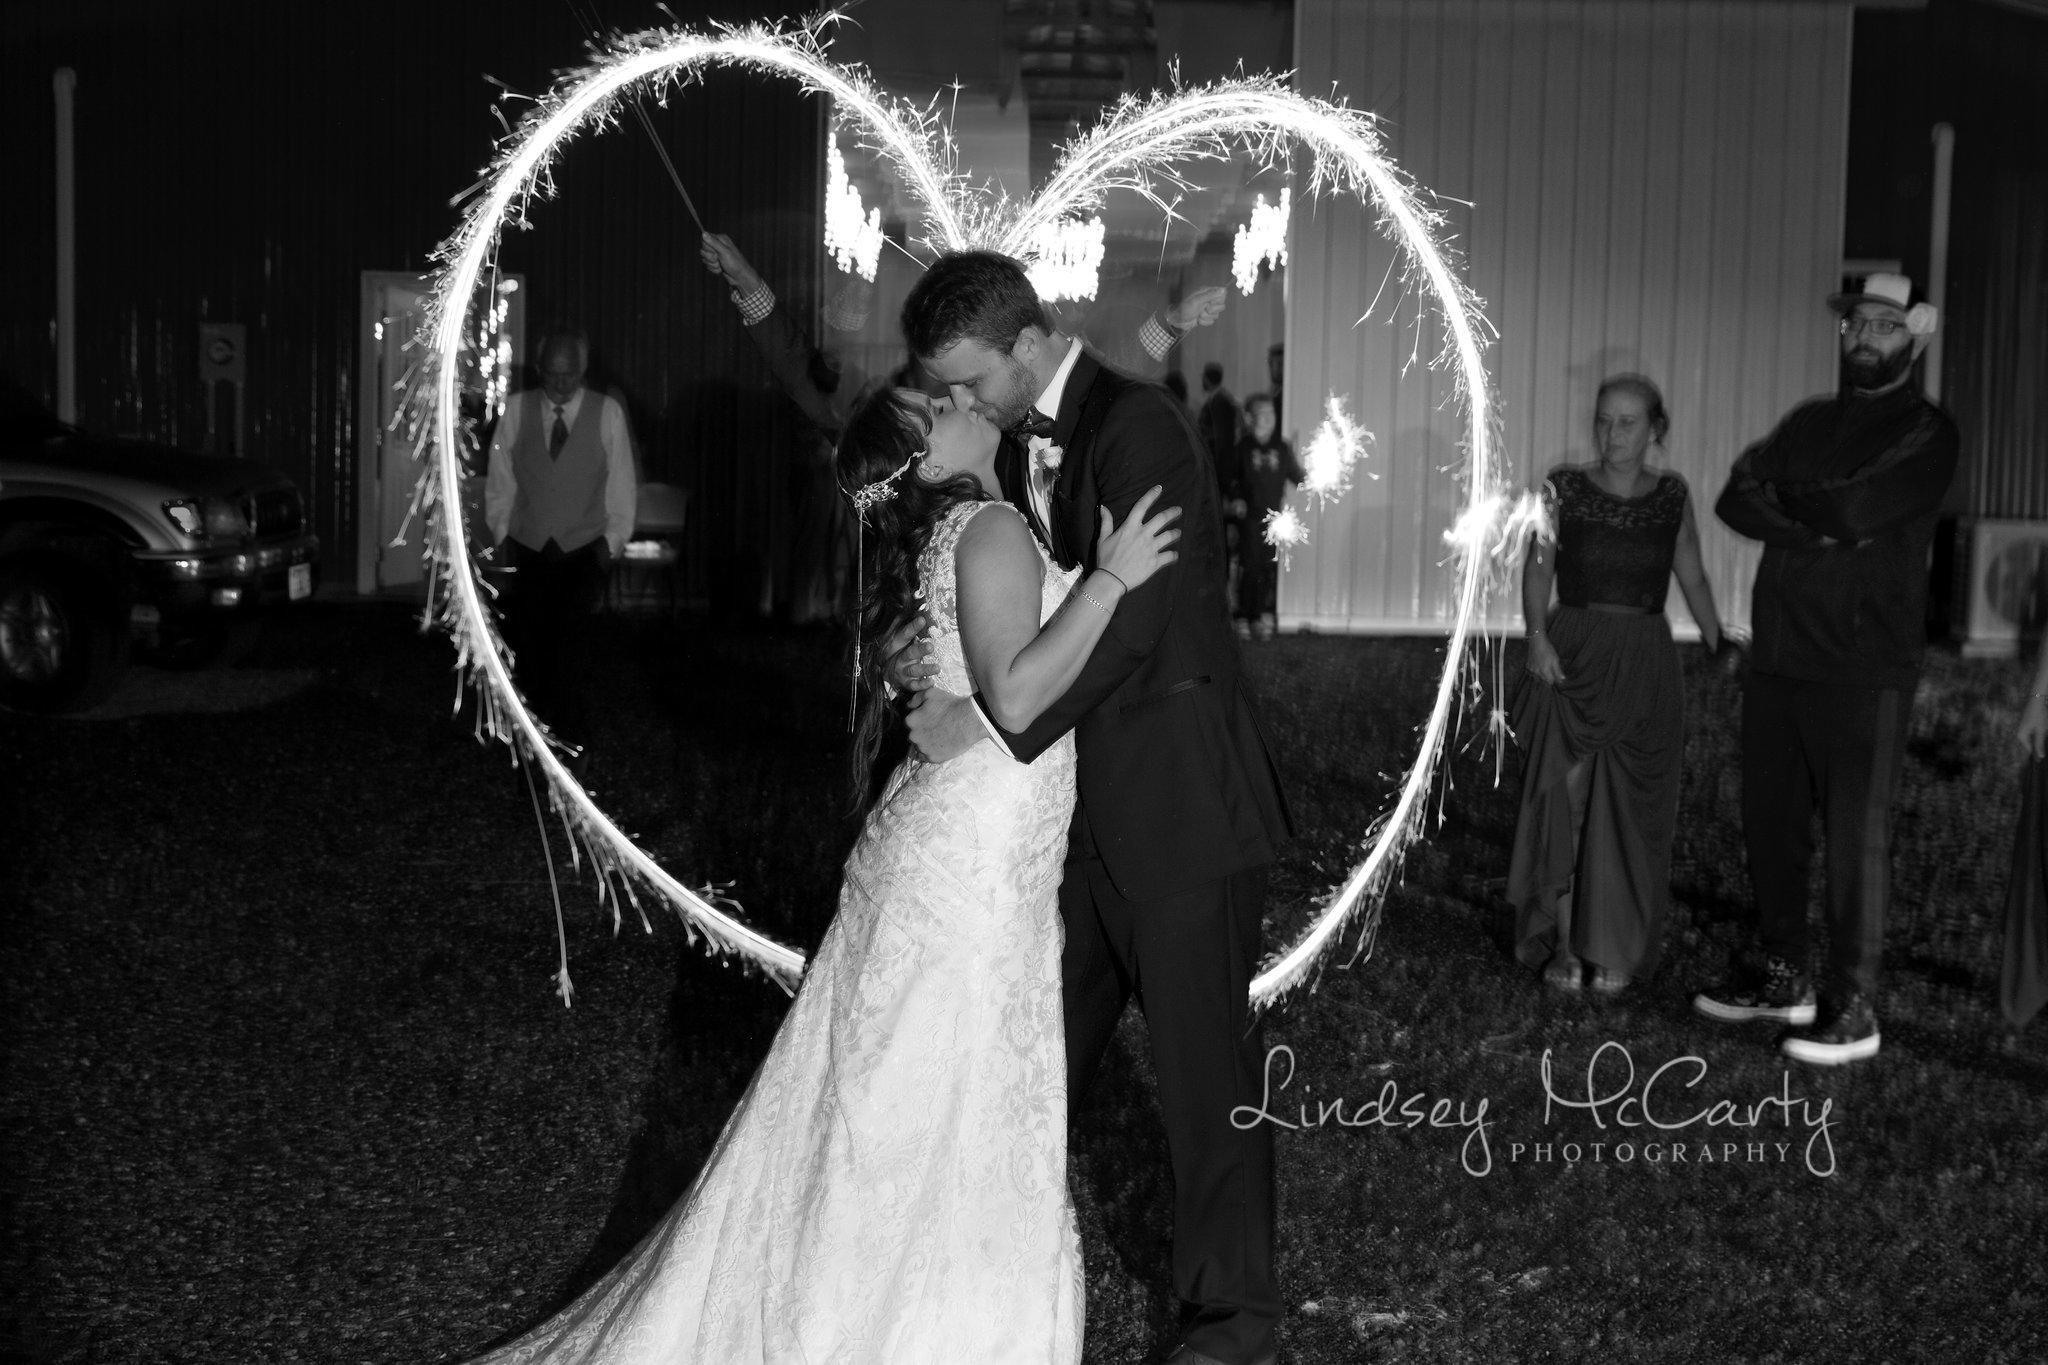 Lindsey McCarty Photography | Roanoke, VA Area Wedding Photography | Bahhur's Events at Whistle Hollow Farm | Fairfield, VA Wedding | Sparkler Exit